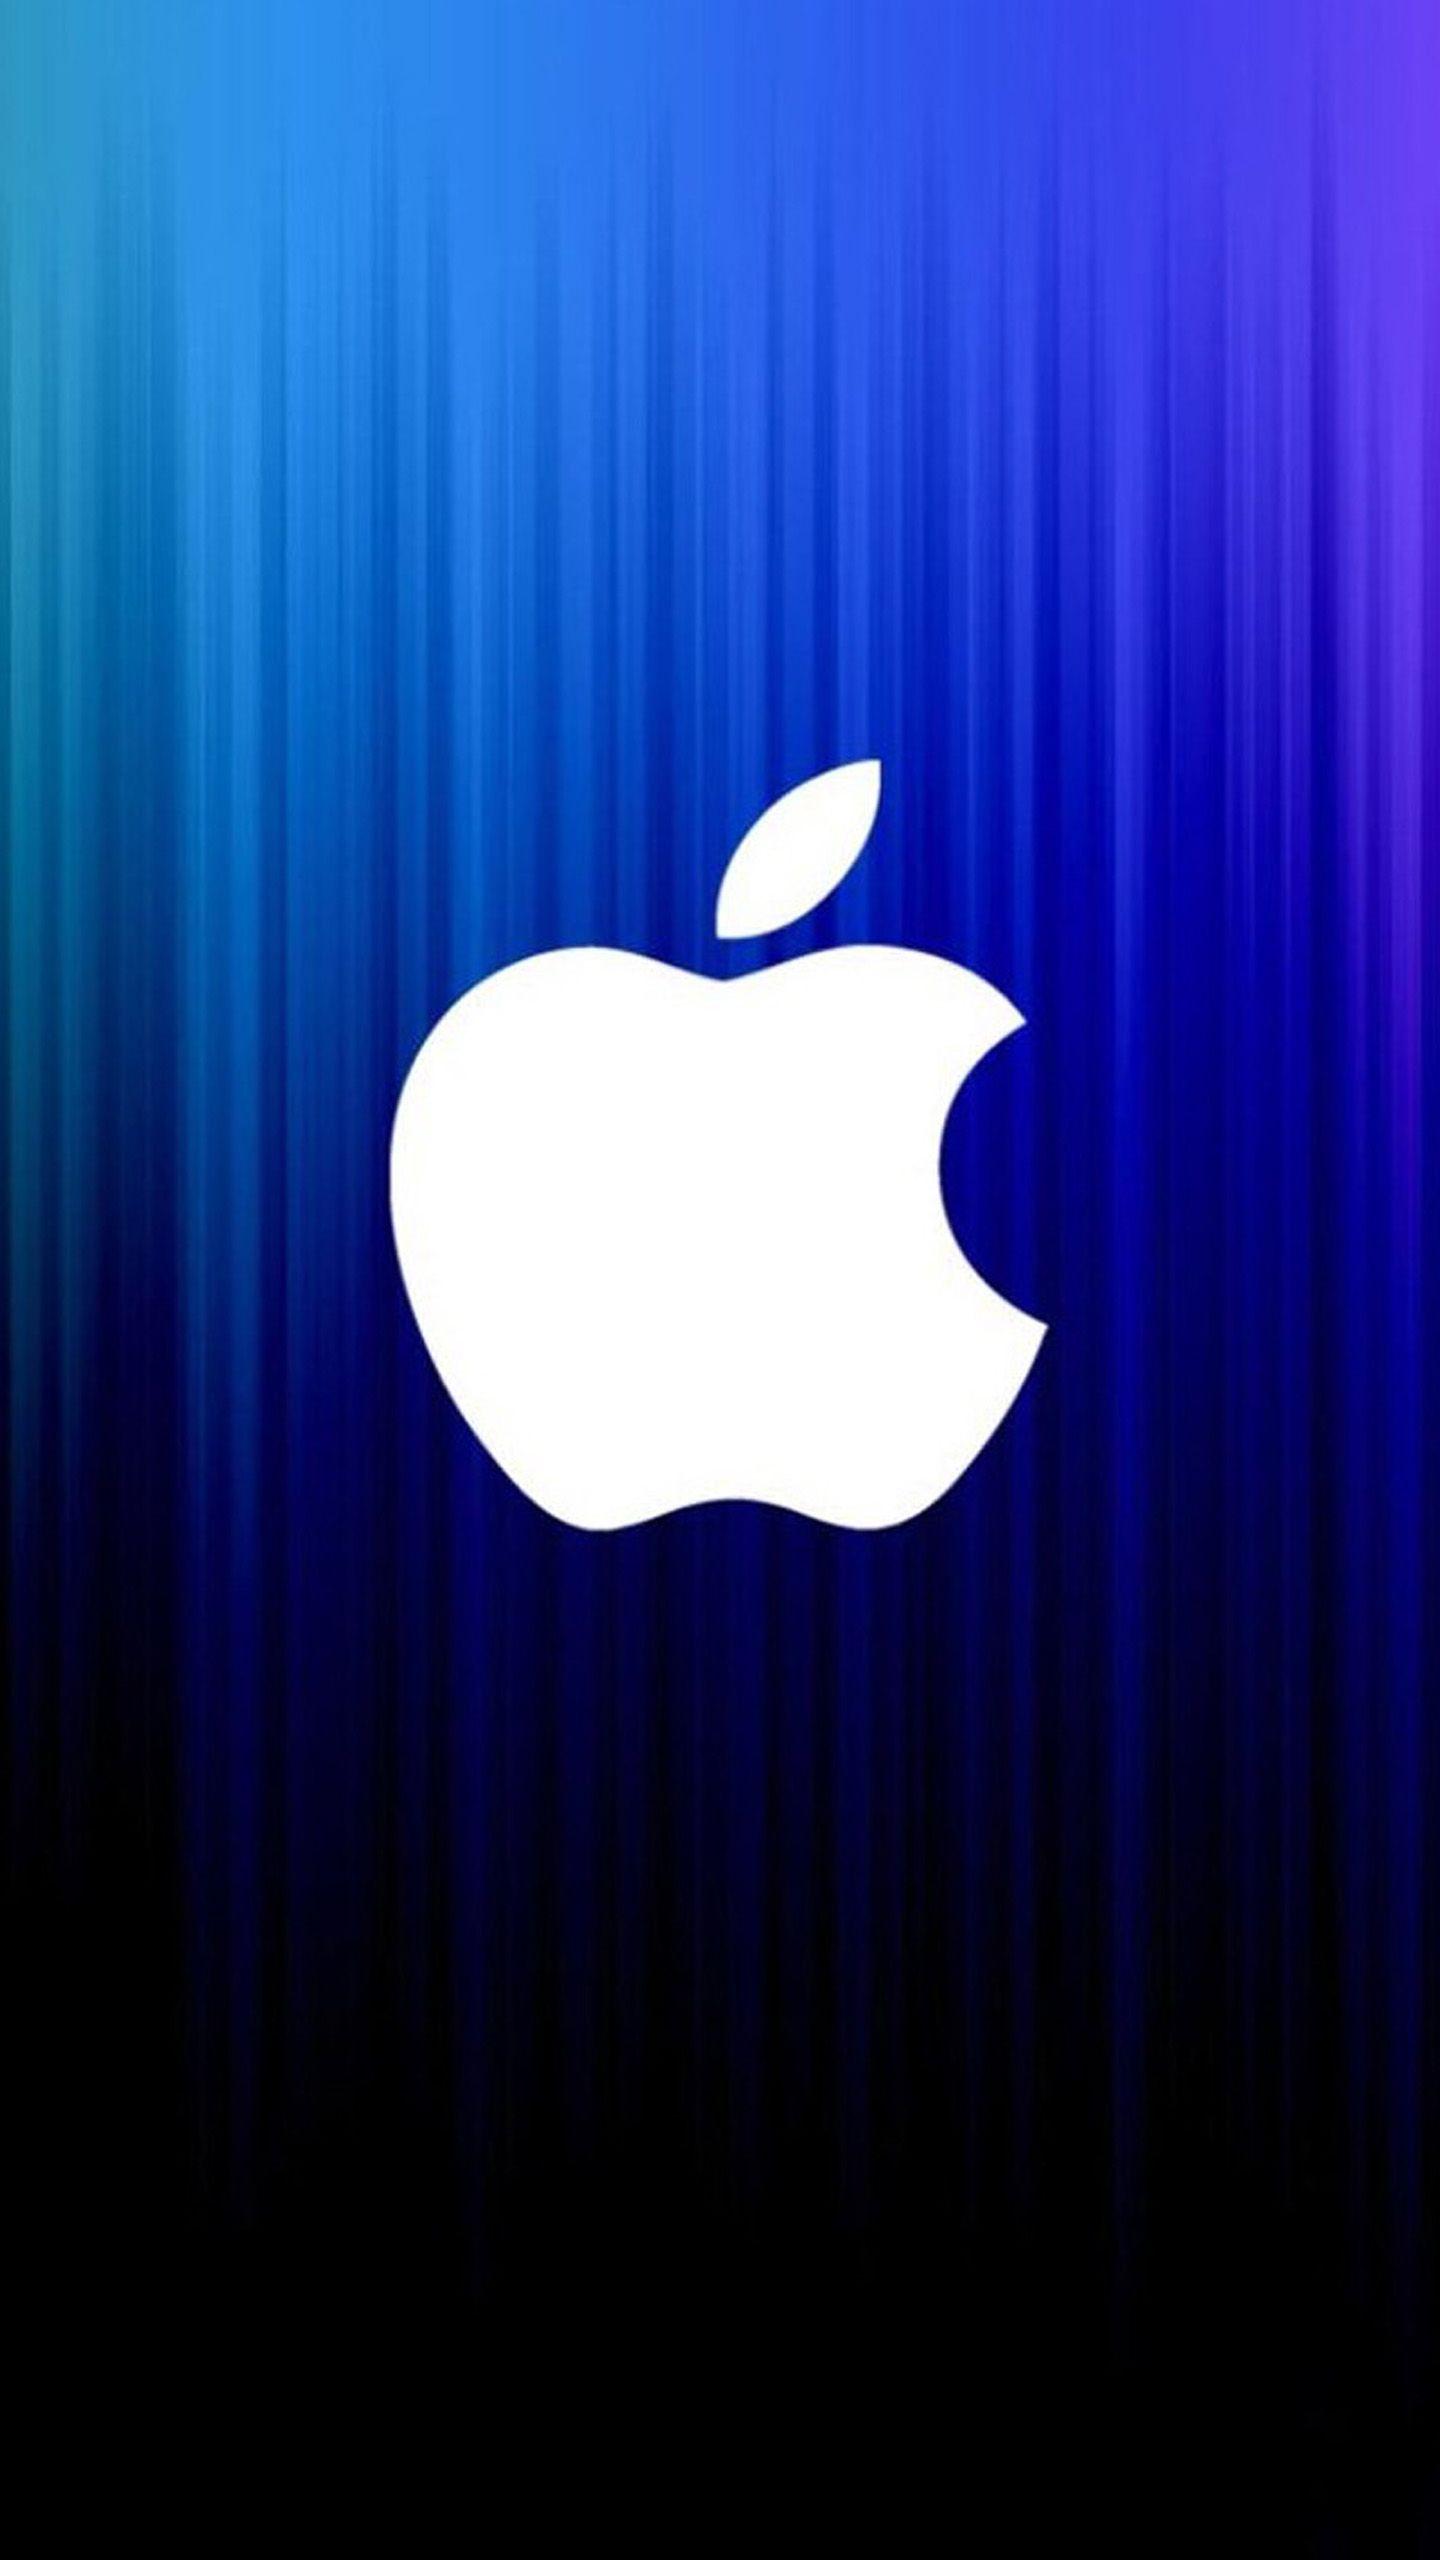 Awesome Apple Logo 8 Galaxy S6 Wallpaper Apple Wallpaper Iphone Apple Galaxy Wallpaper Iphone 7 Plus Wallpaper